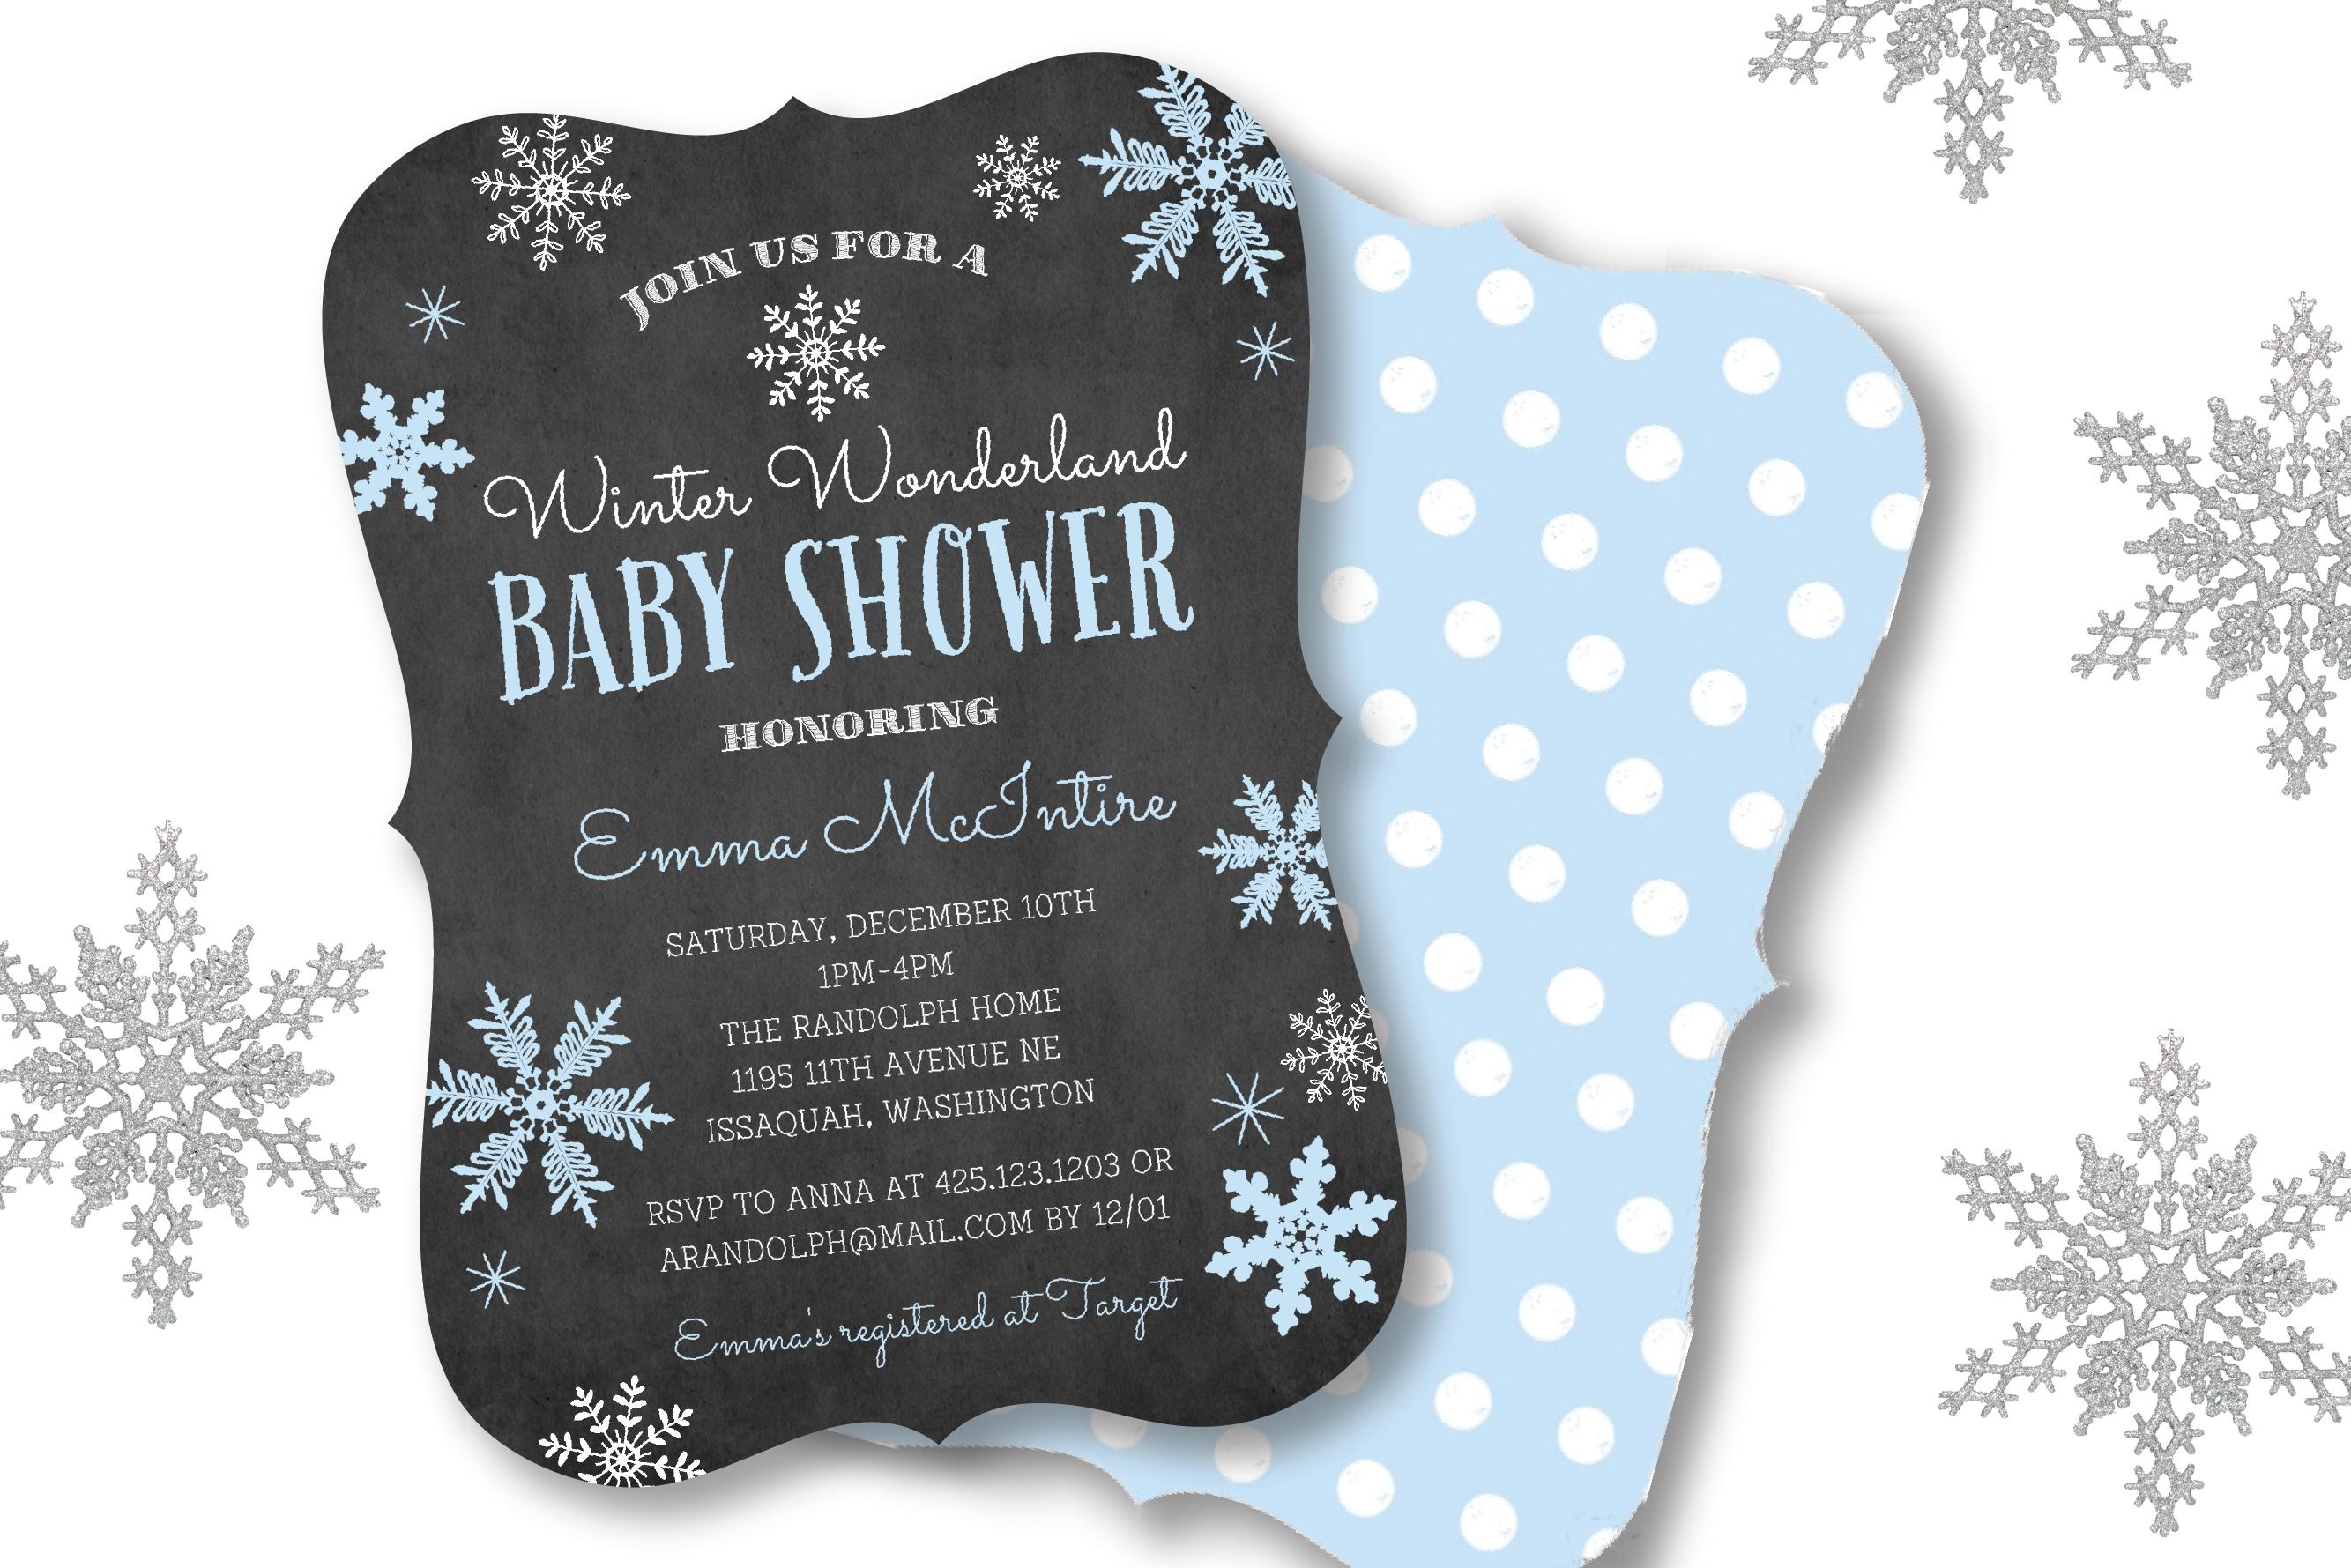 winterwonderlandbabyshower 01 - Christmas Themed Baby Shower